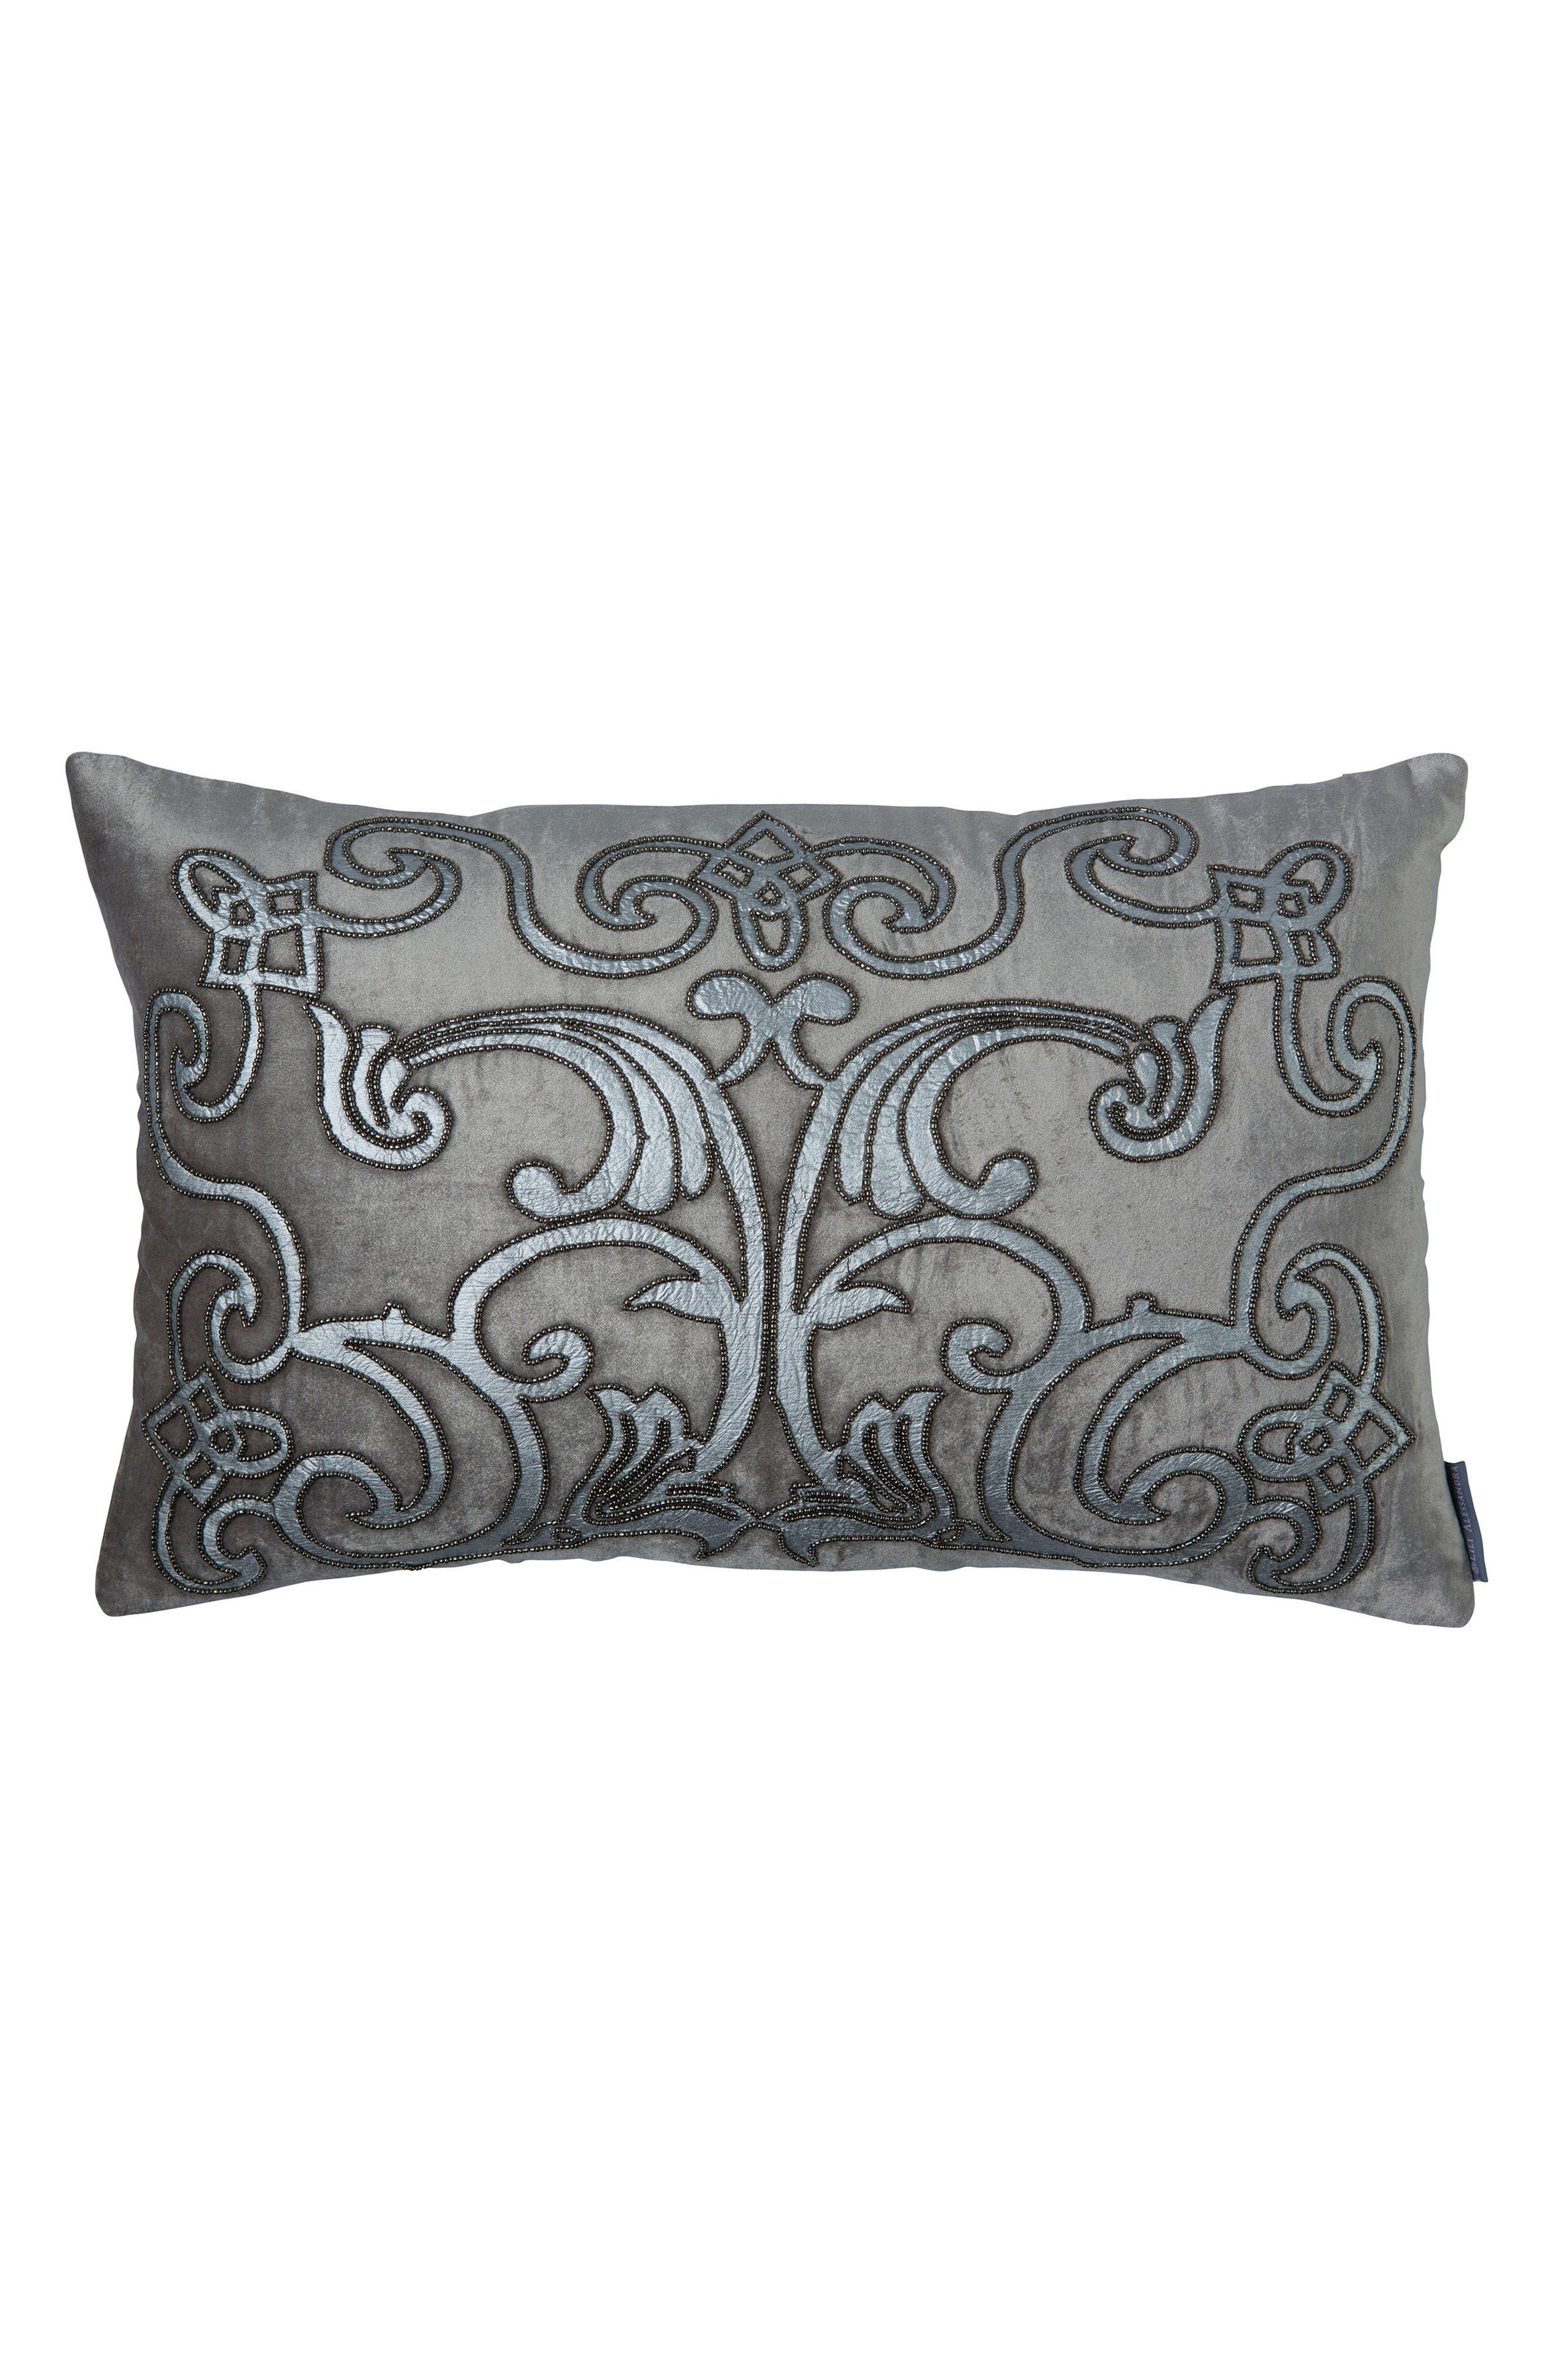 Main Image - Lili Alessandra Mozart Rectangular Accent Pillow